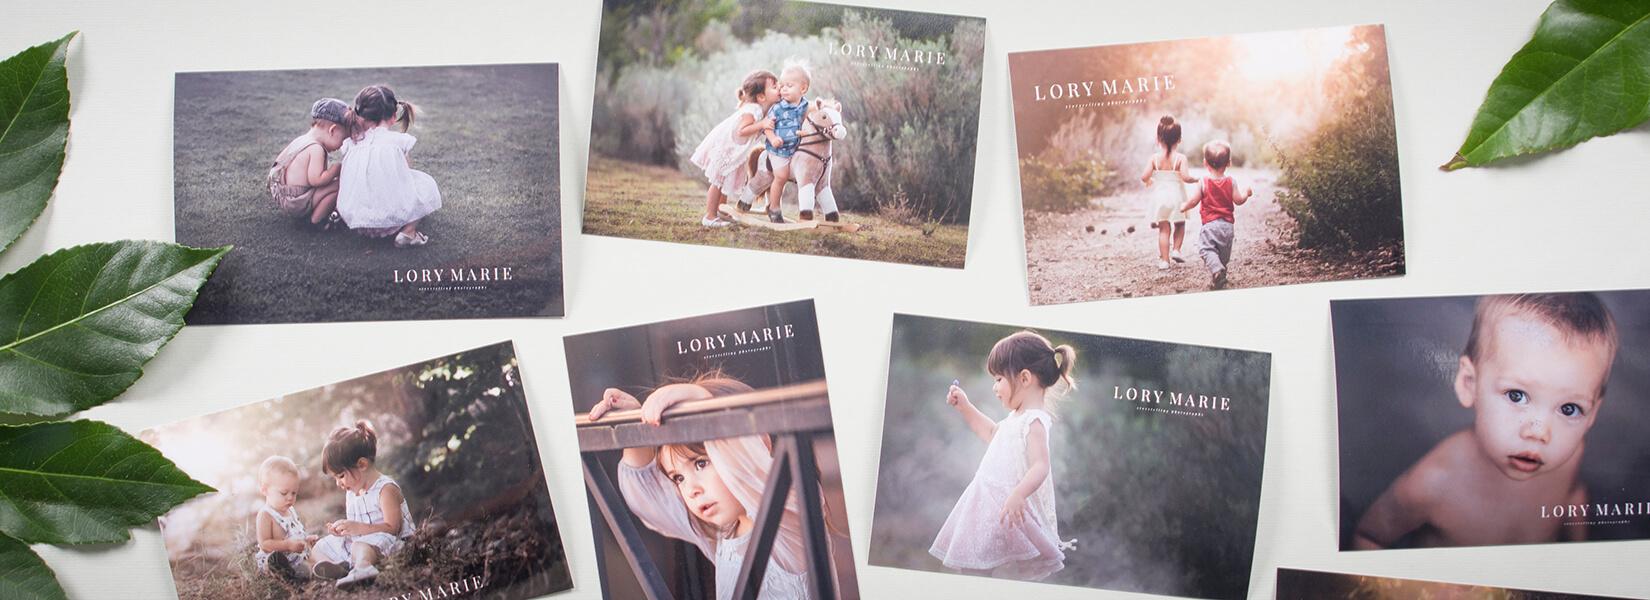 Prints | Professional Printing Services | nPhoto Lab UK